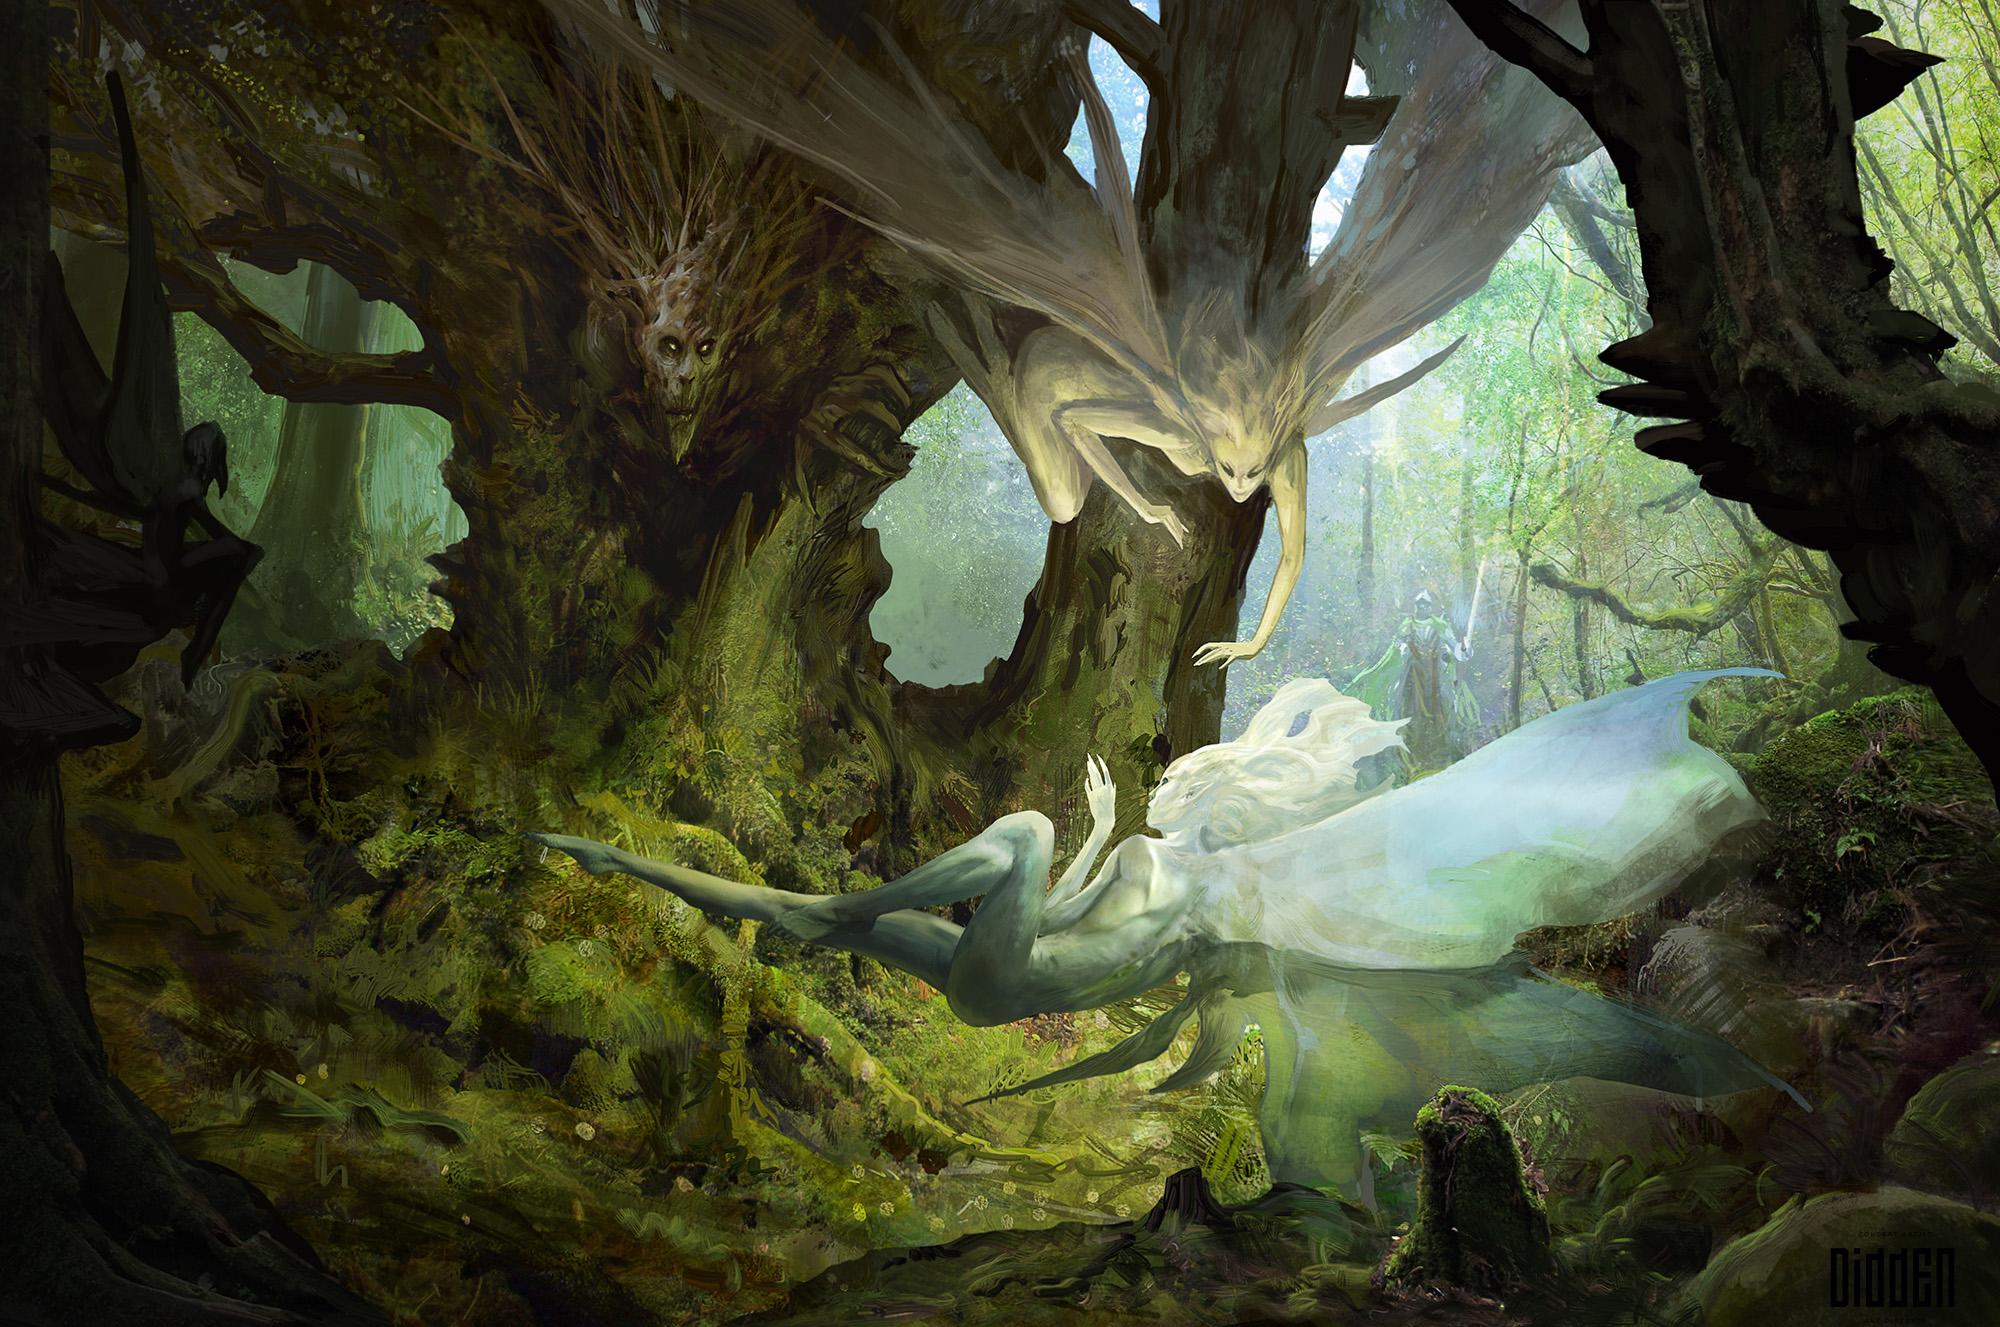 floris_didden_faeries_web